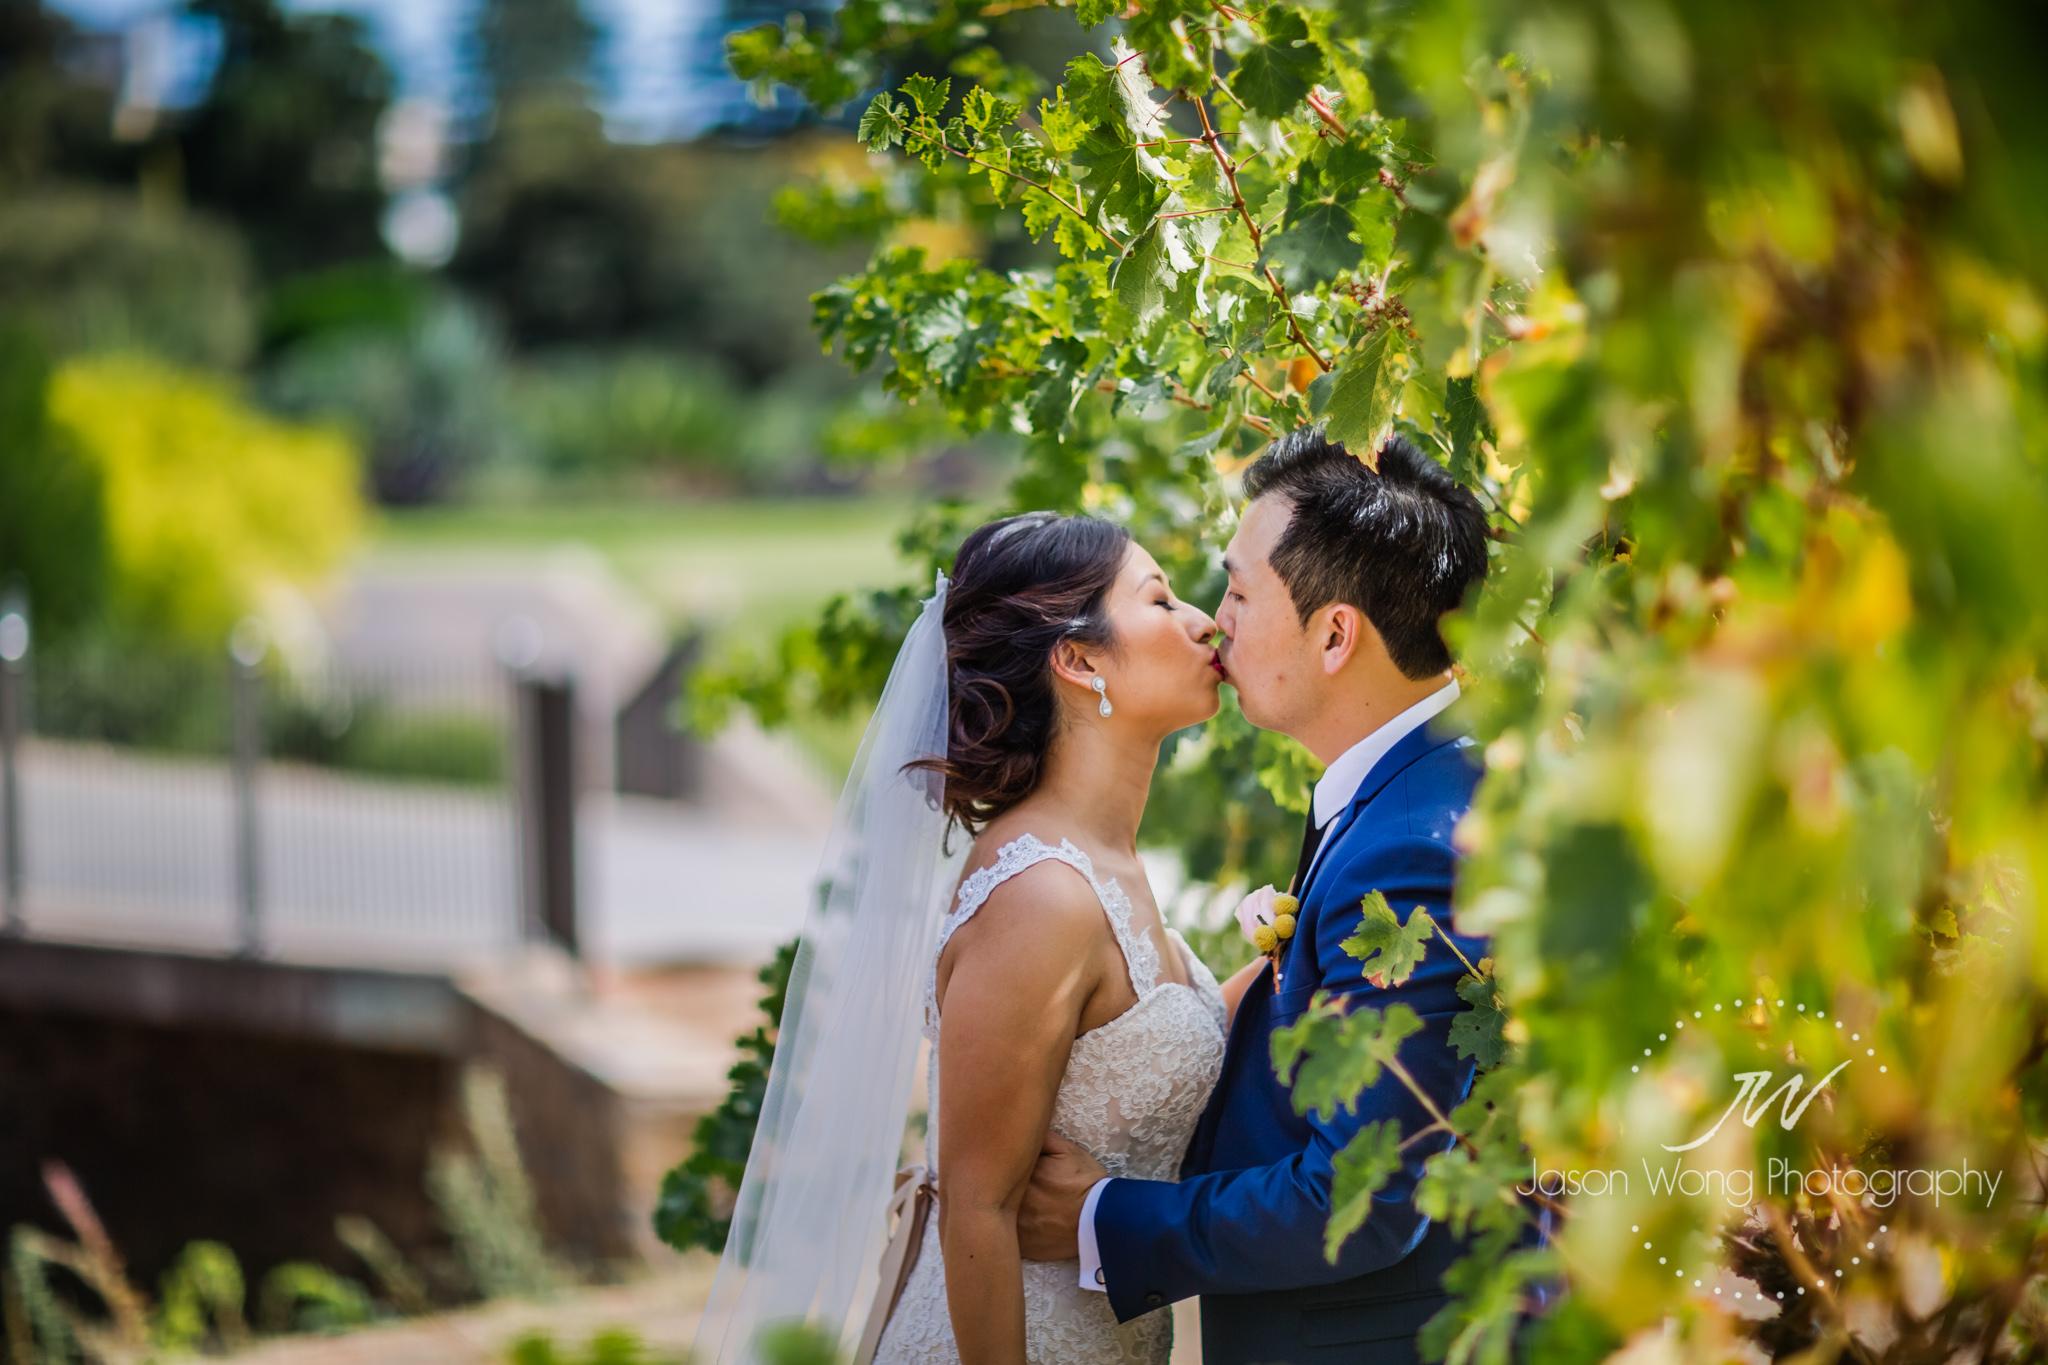 vineyard-romantic-newlywed-kiss.jpg